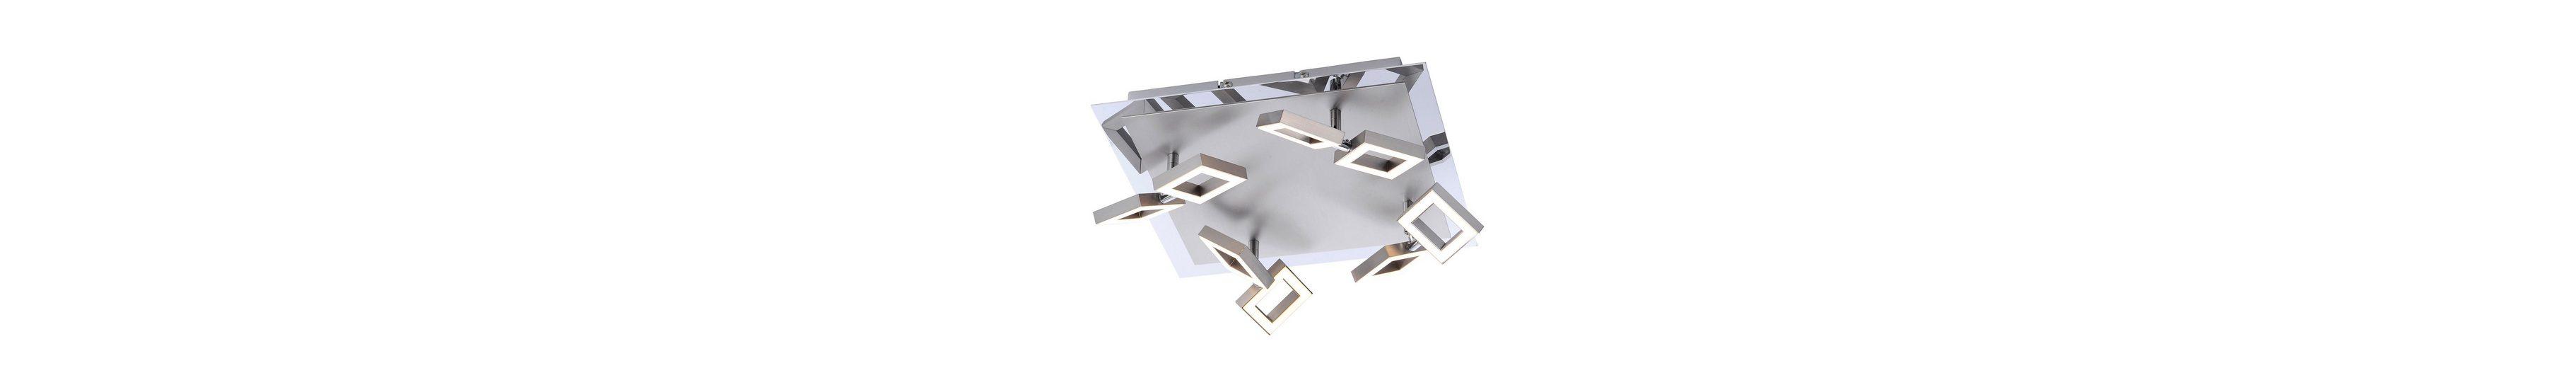 Paul Neuhaus LED-Deckenleuchte, 8flg., »TWINS«